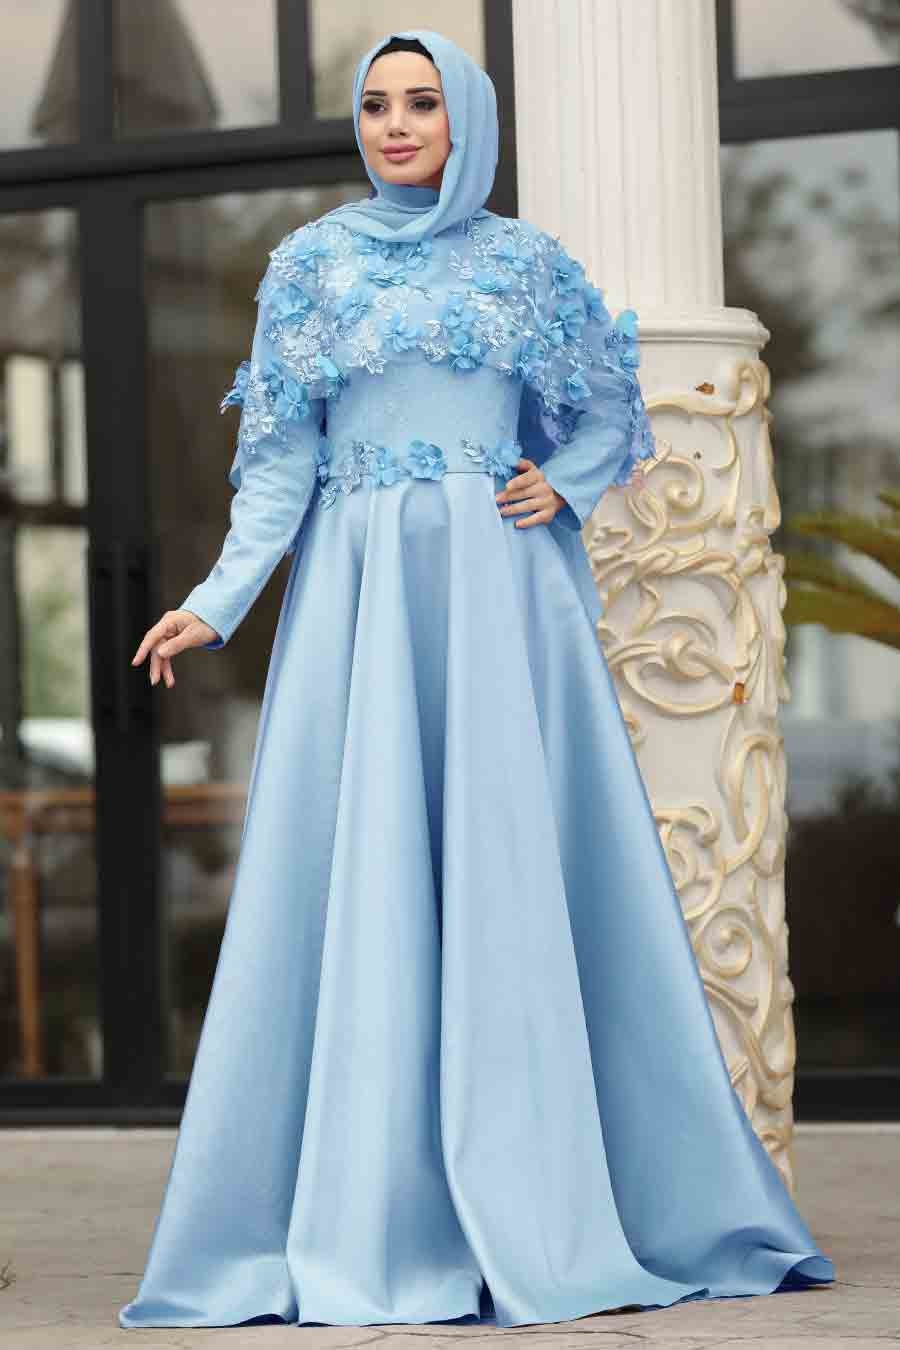 فستان سهرة أزرق فاتح بجزء علوي 3D نسائي